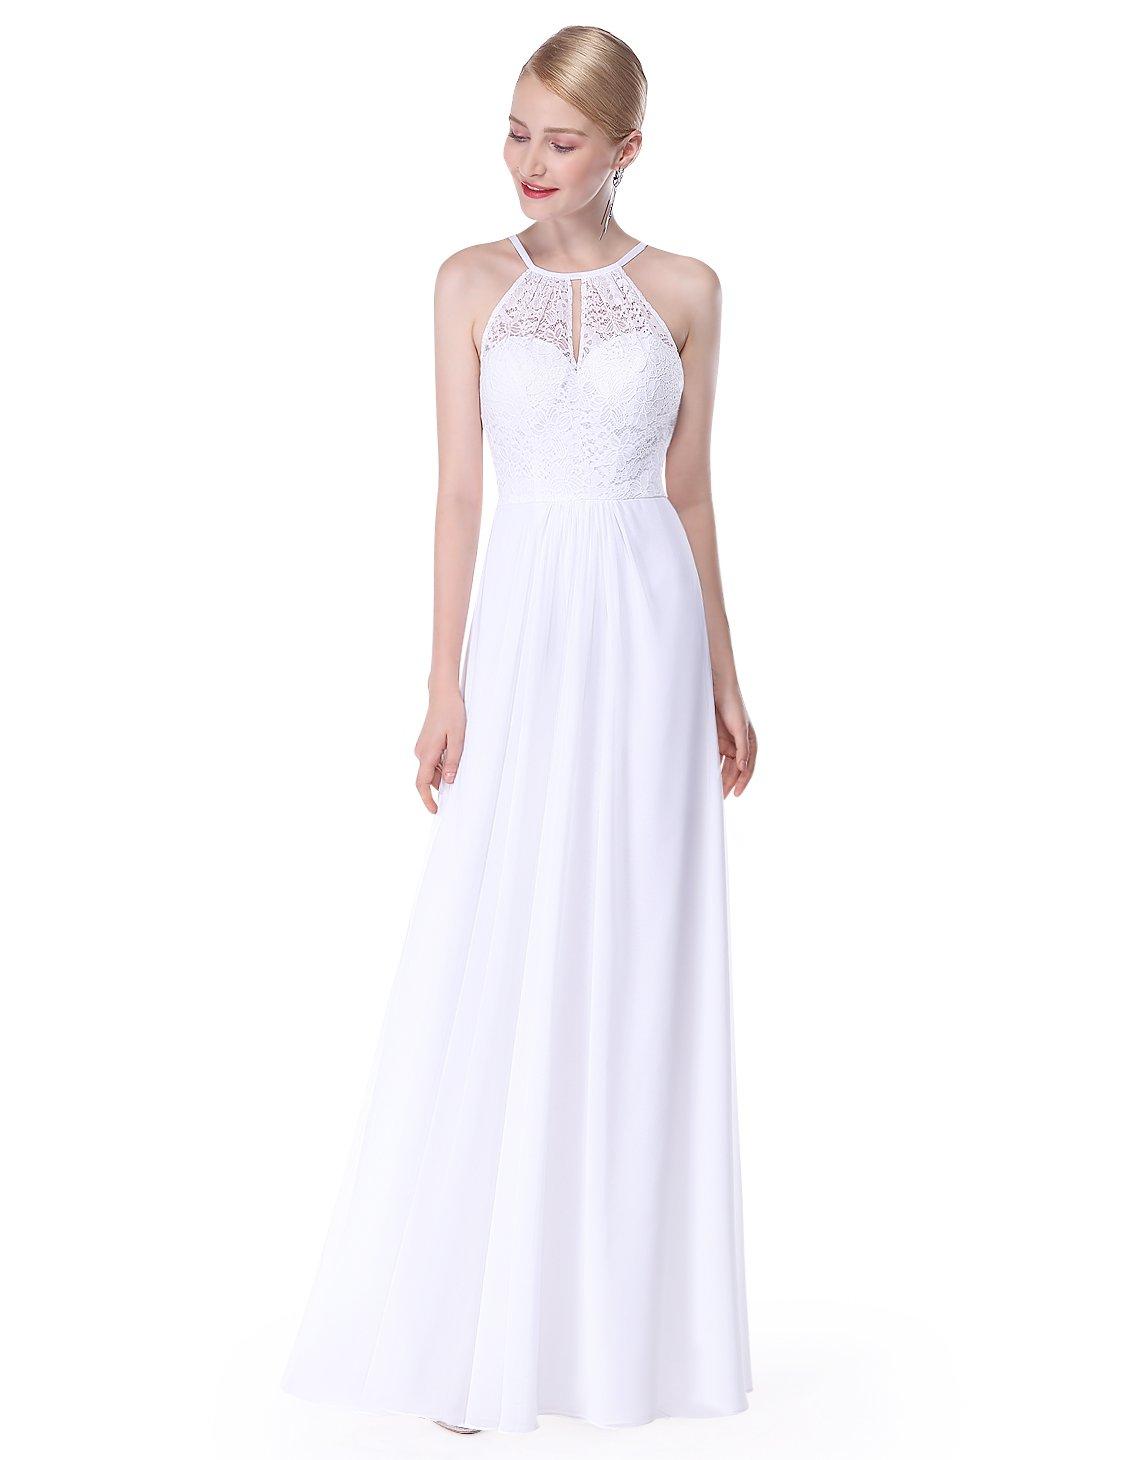 Ever-Pretty Womens Sleeveless Floor Length Simple Empire Waist Beach Wedding Dress 6 US White